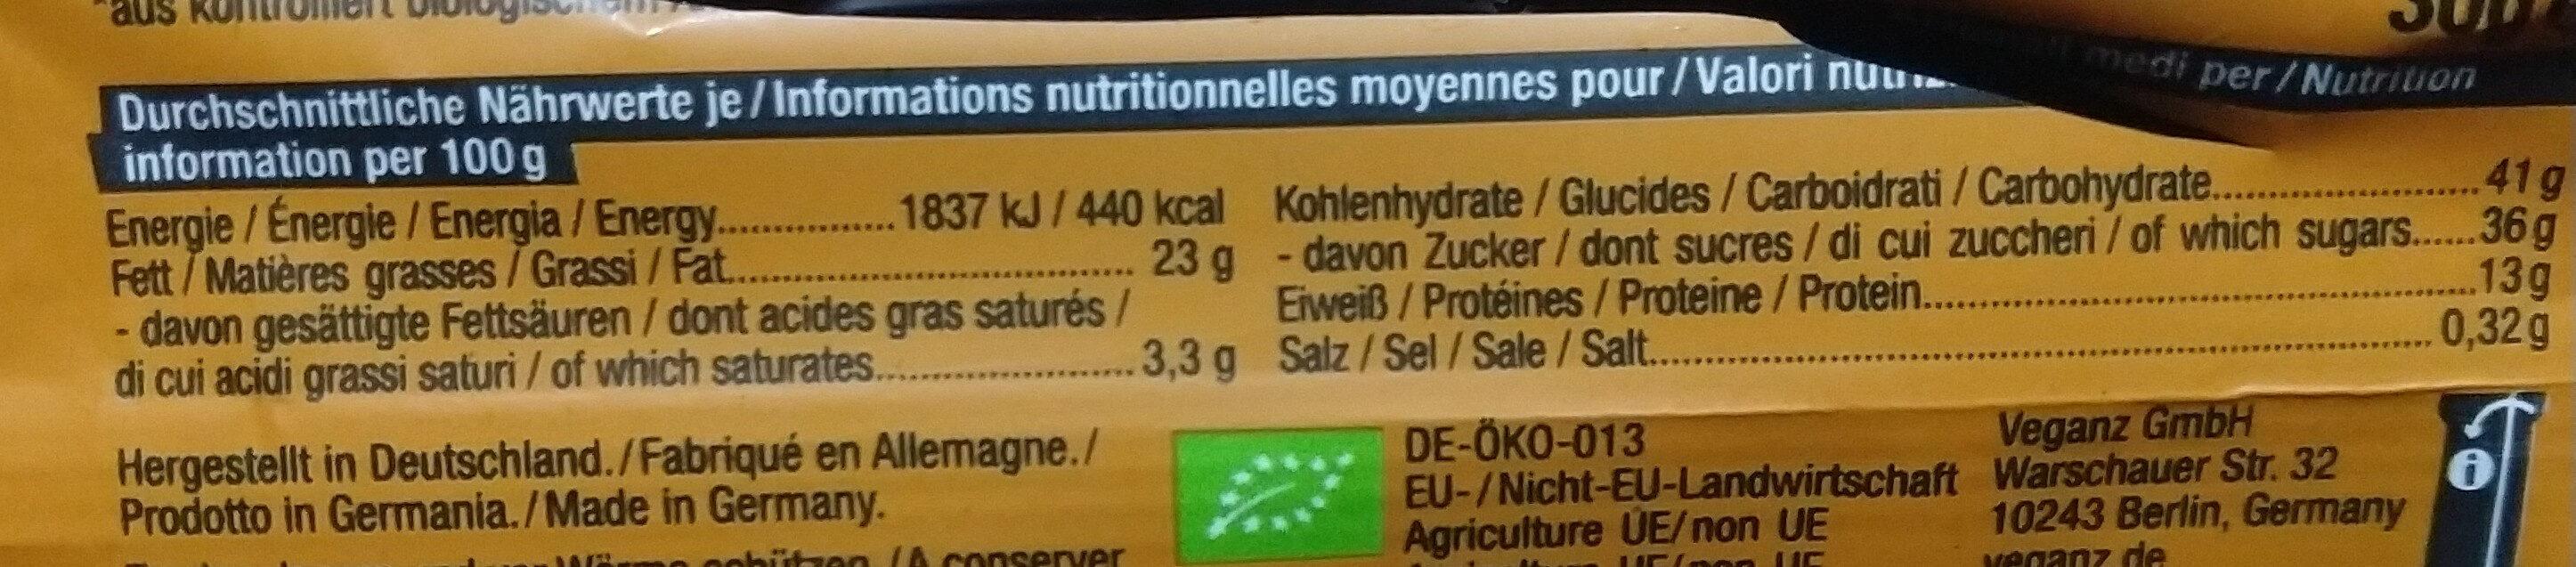 snack bar peanut - Nutrition facts